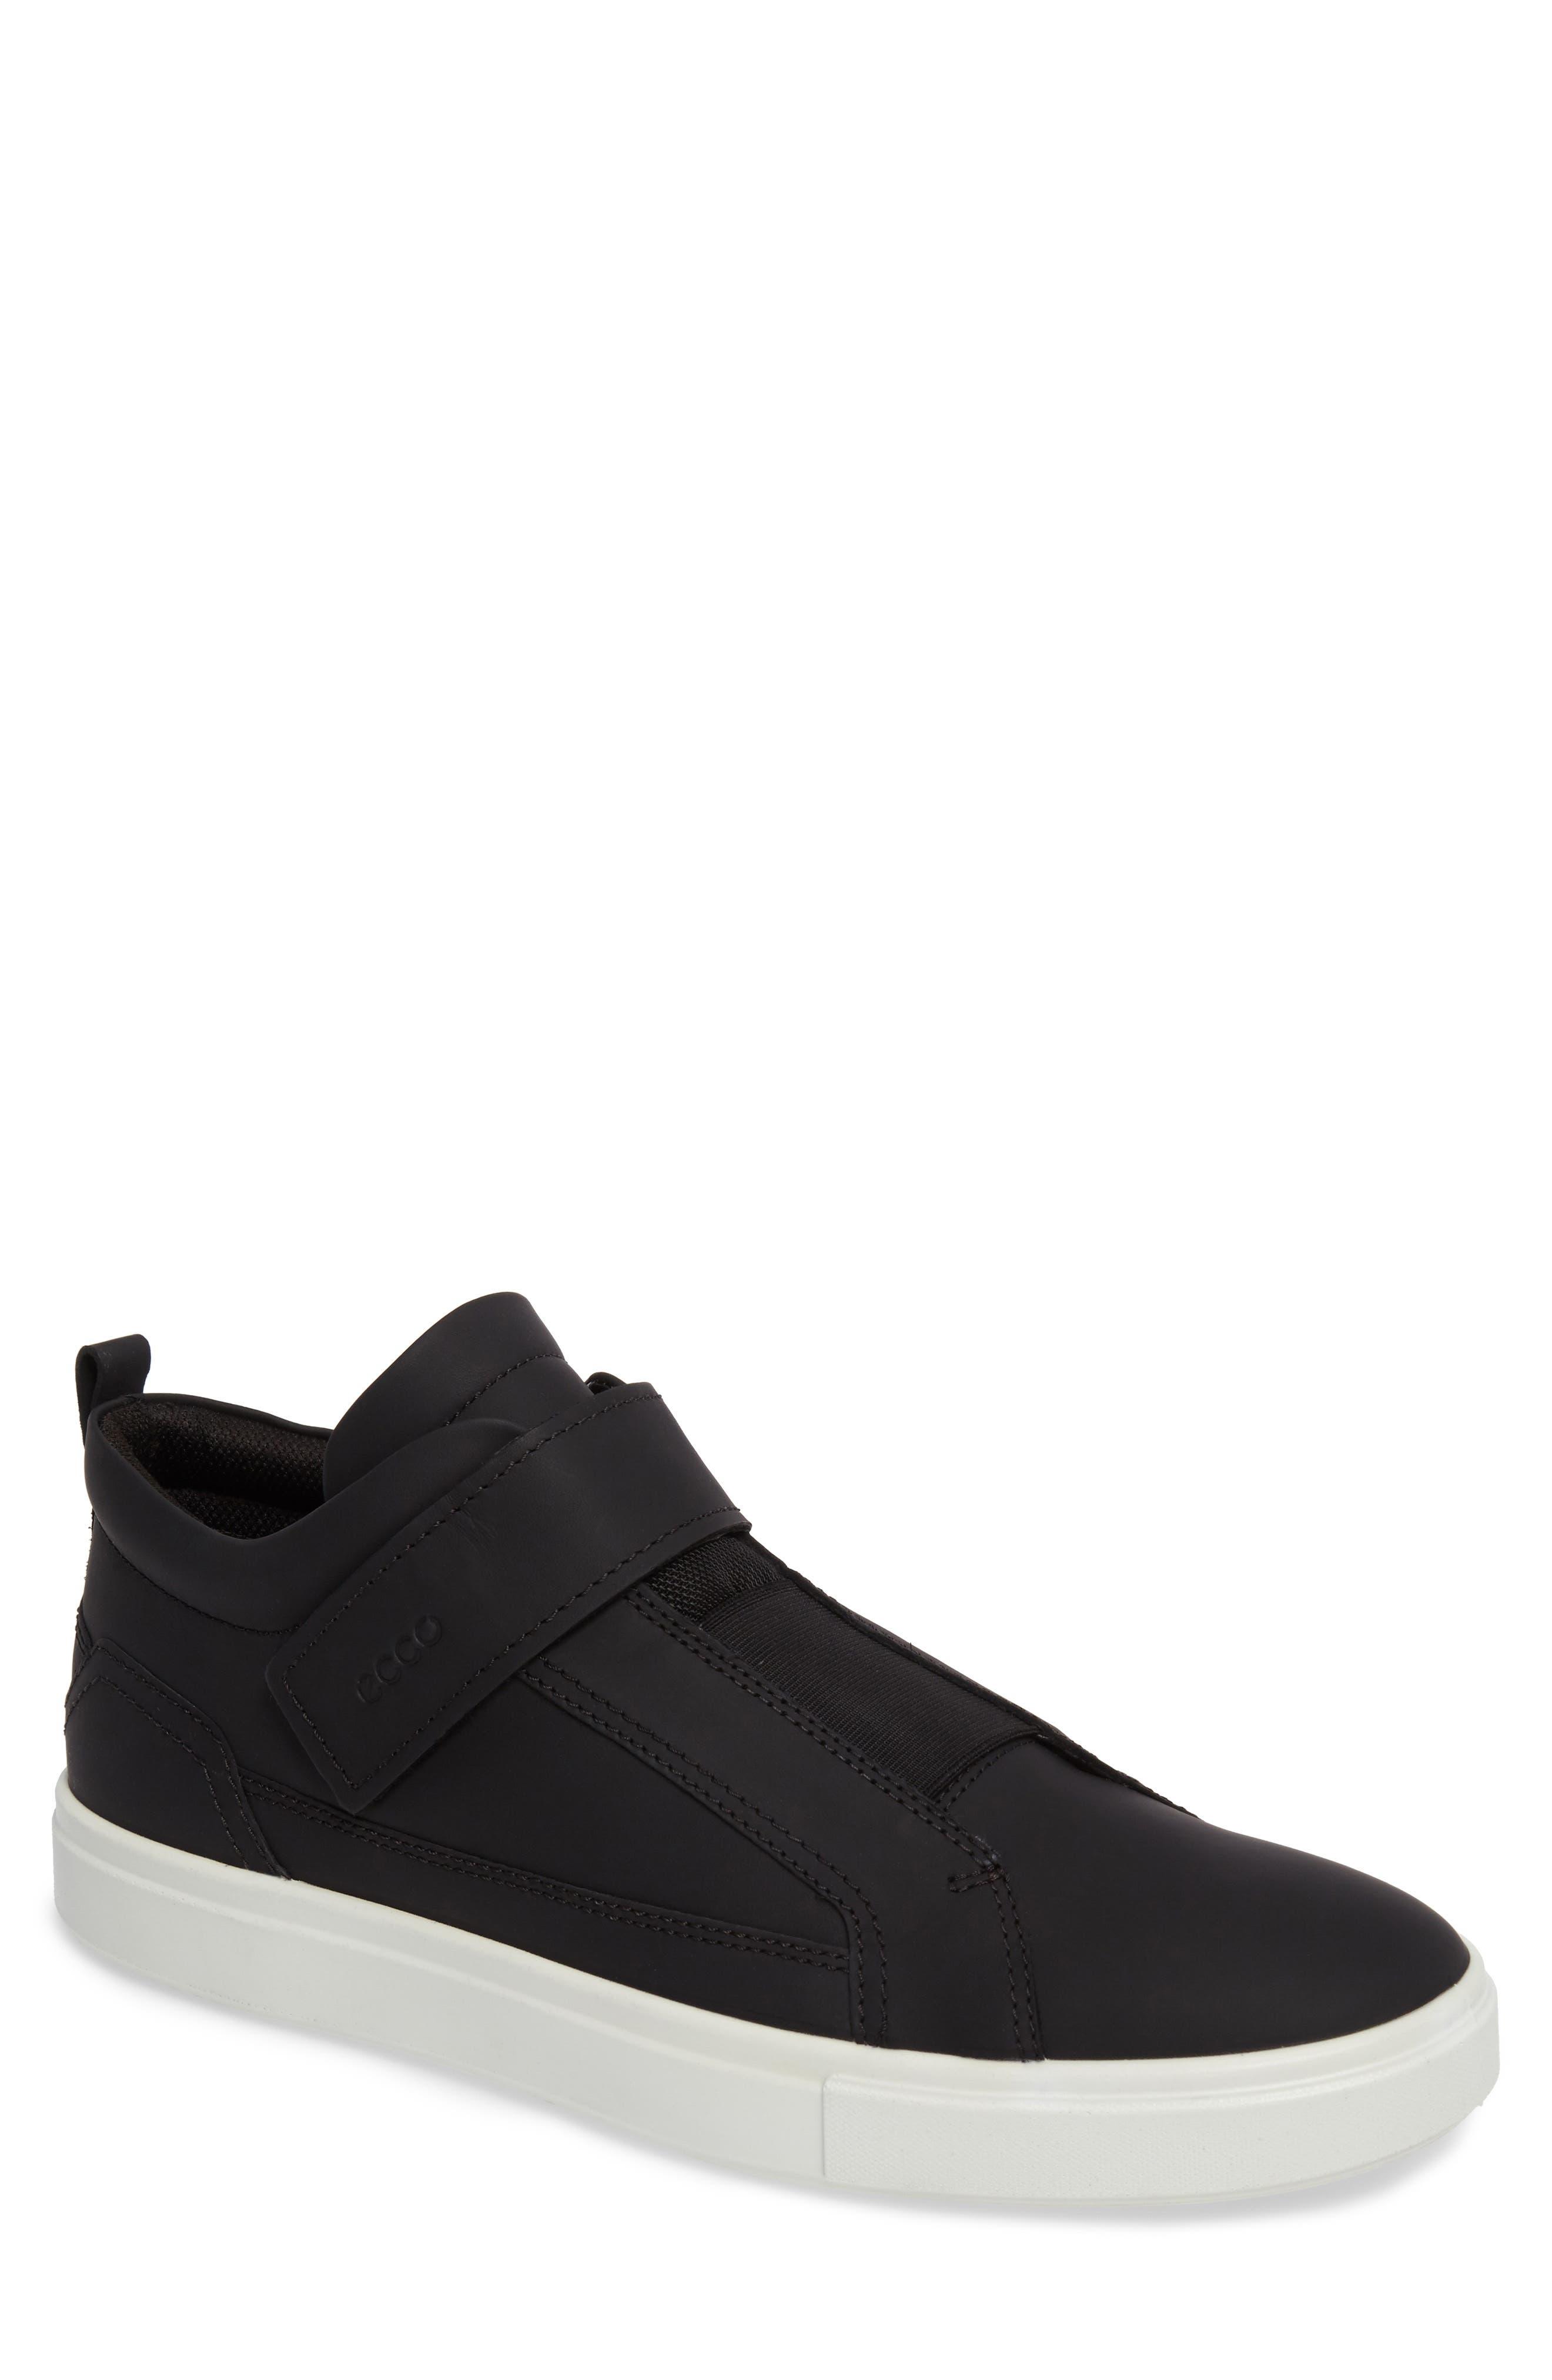 Kyle Sneaker,                         Main,                         color, 001